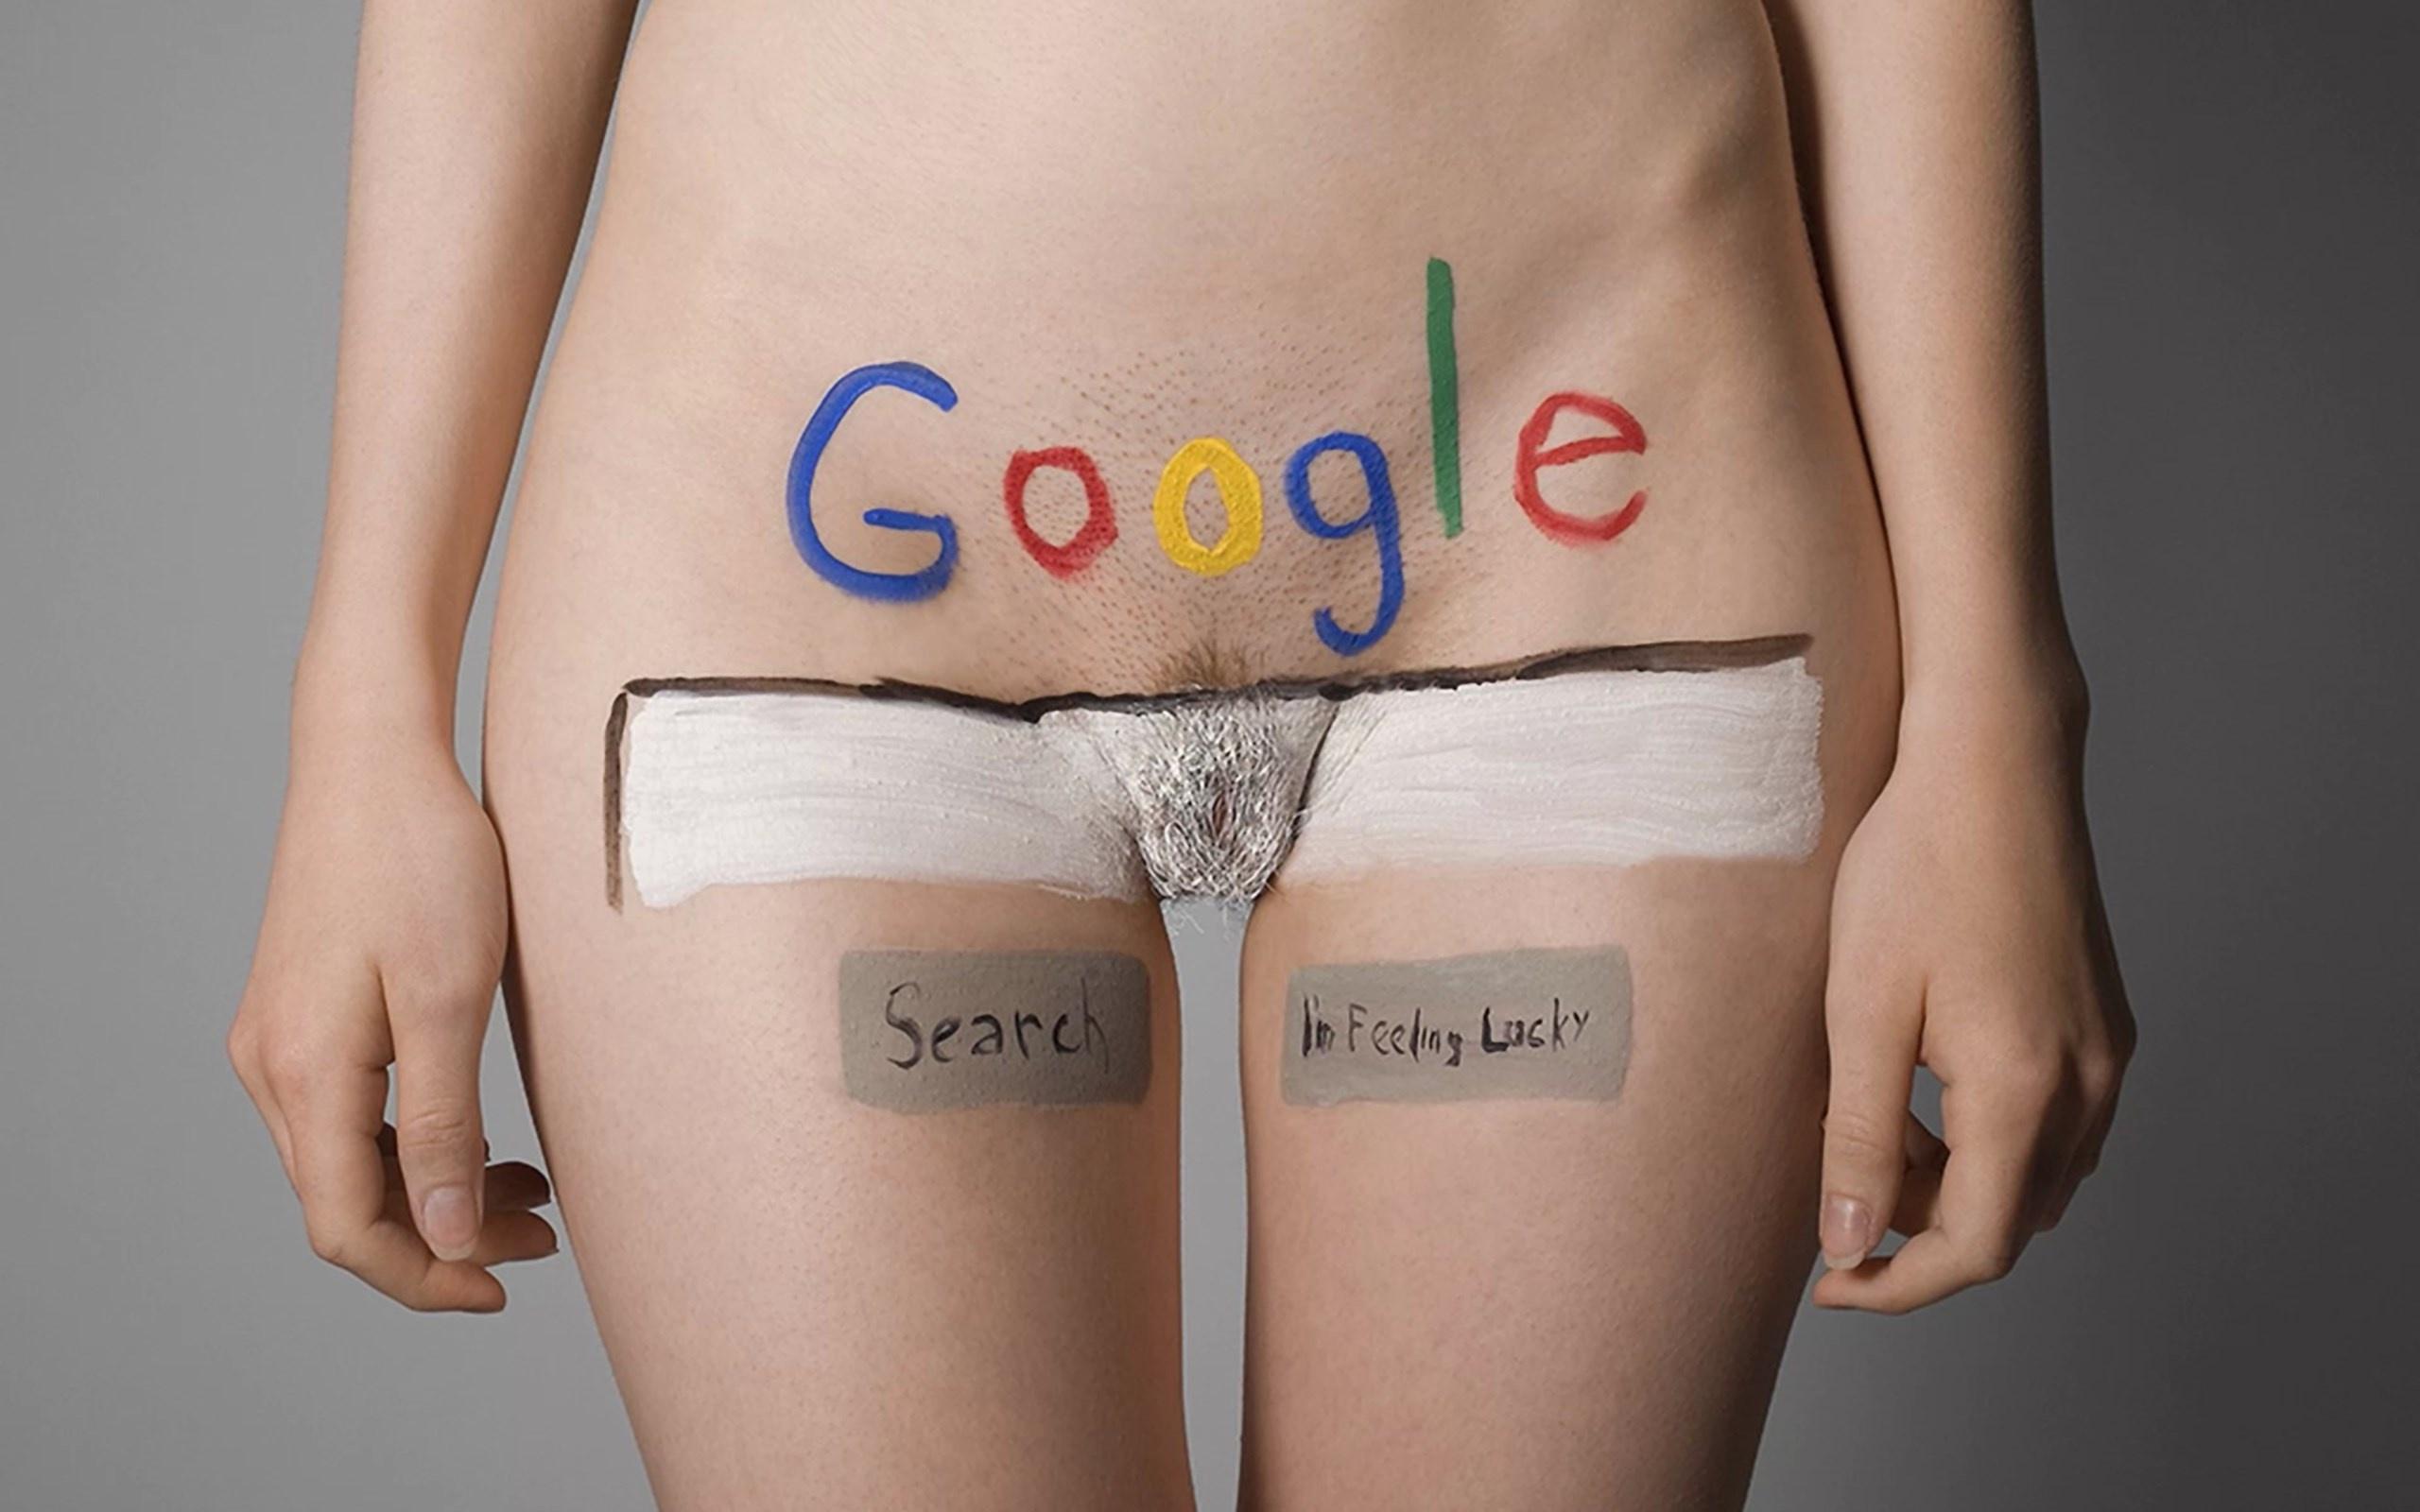 Гугл эротика фото